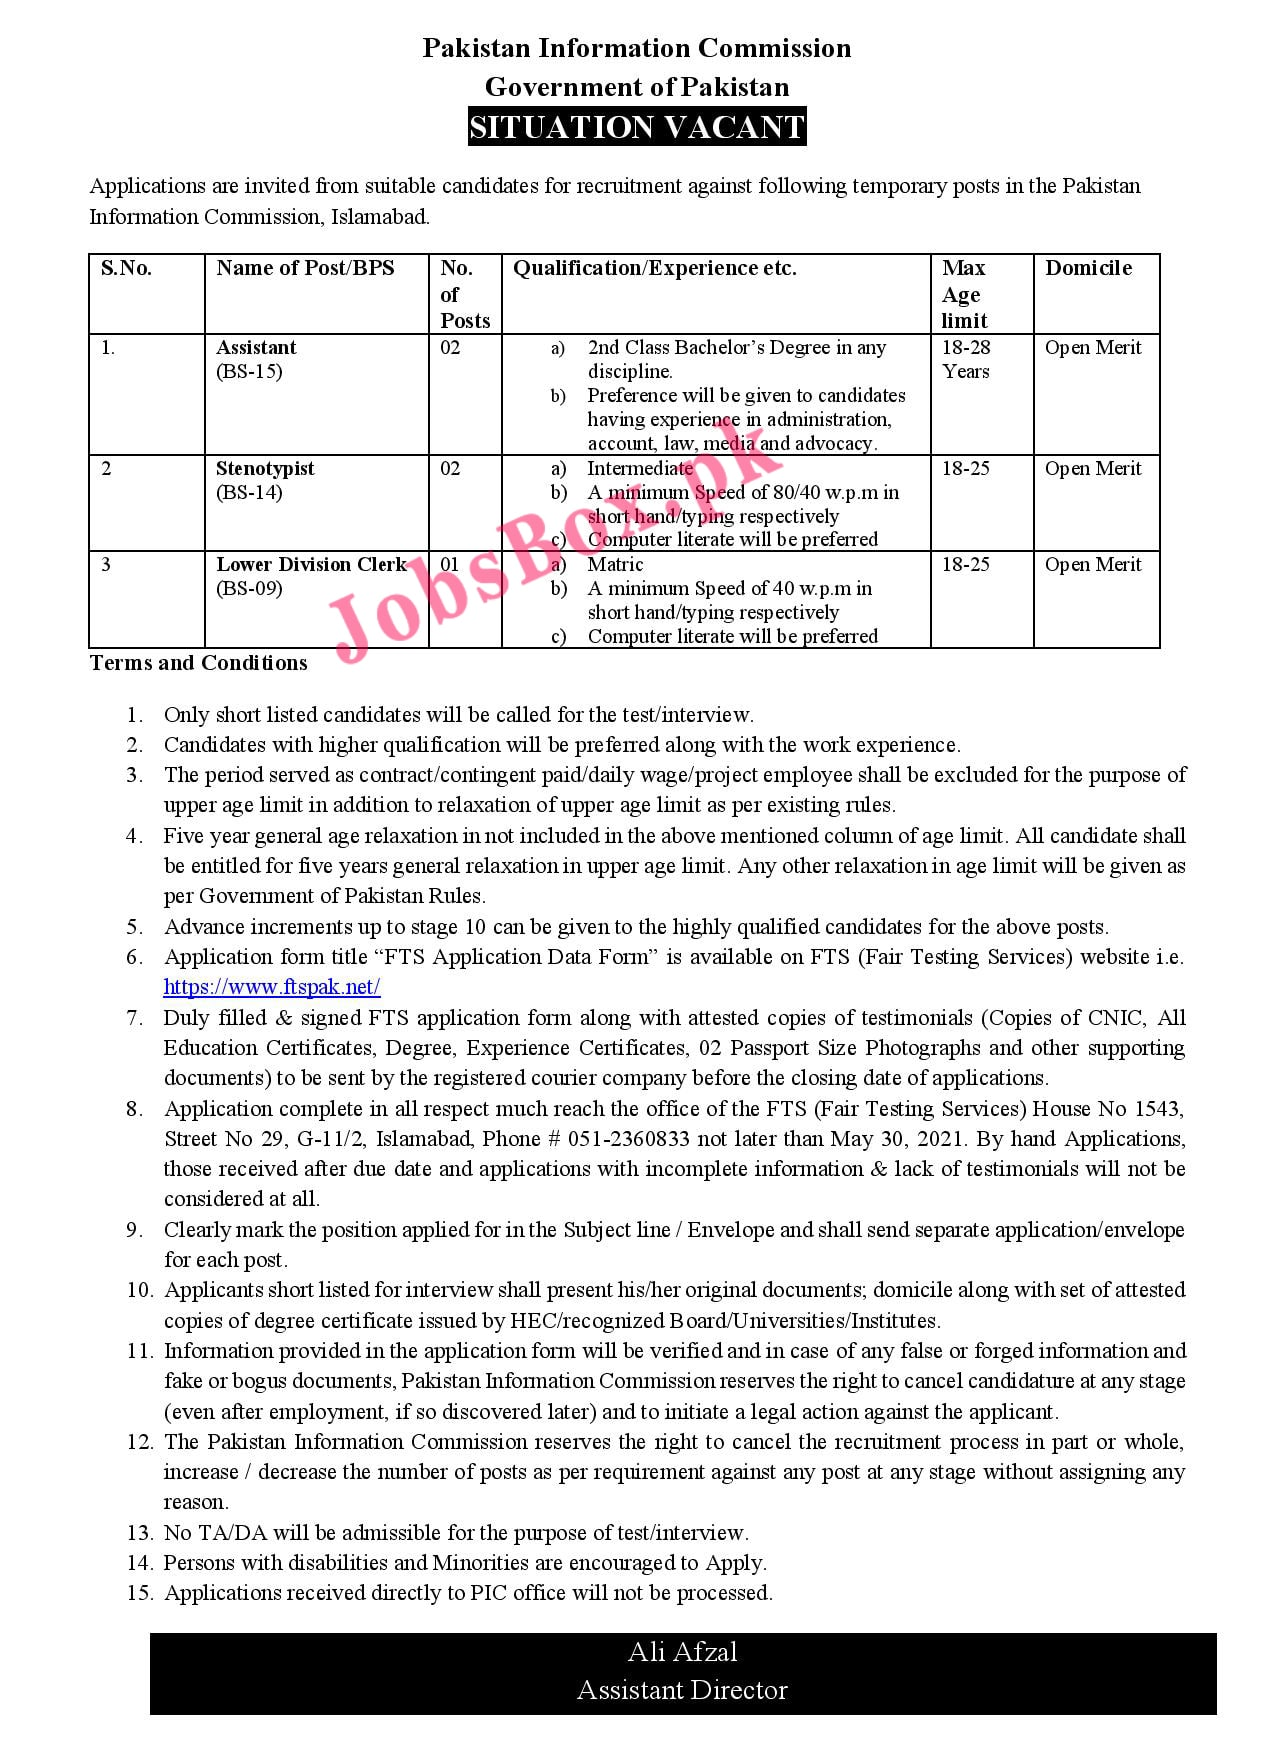 Latest Pakistan Information Commission PIC Jobs Advertisement 2021